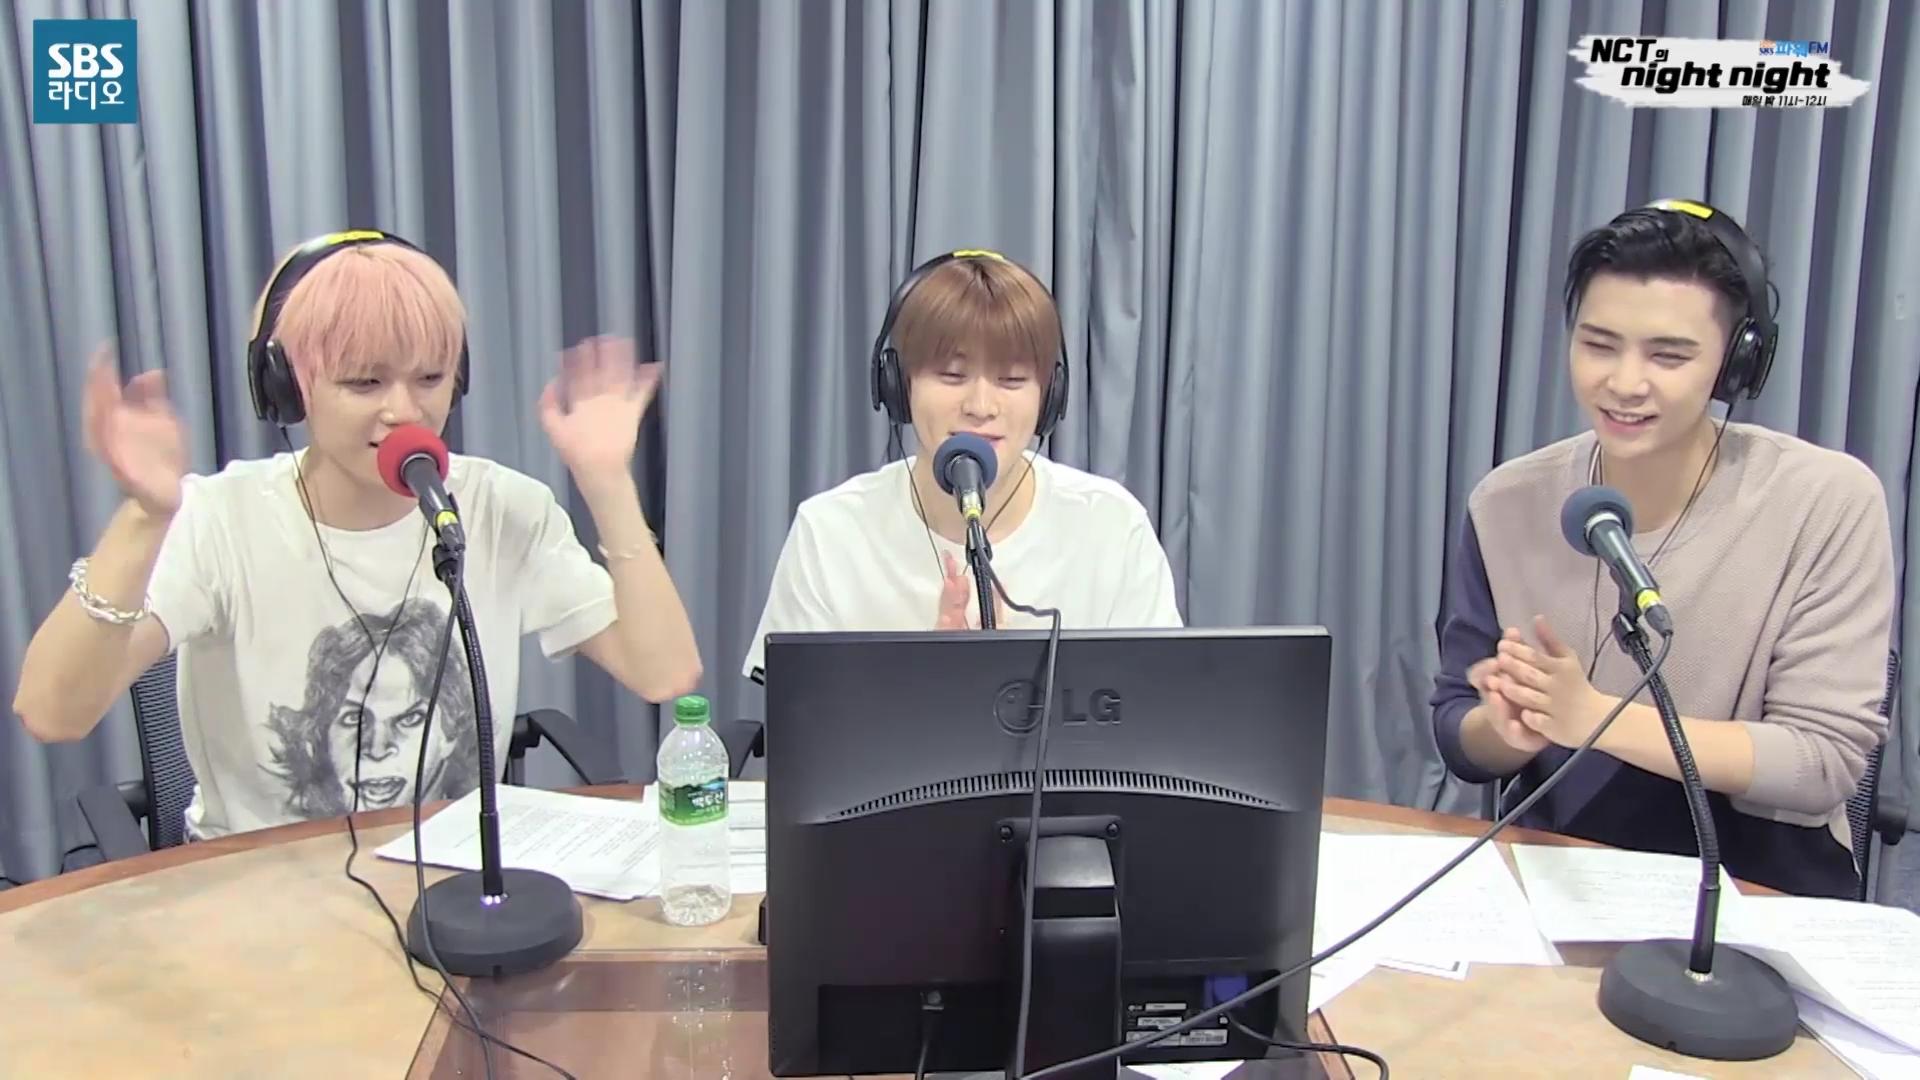 NCT 태용과 함께하는 '동심 DREAM' 녹음 현장!